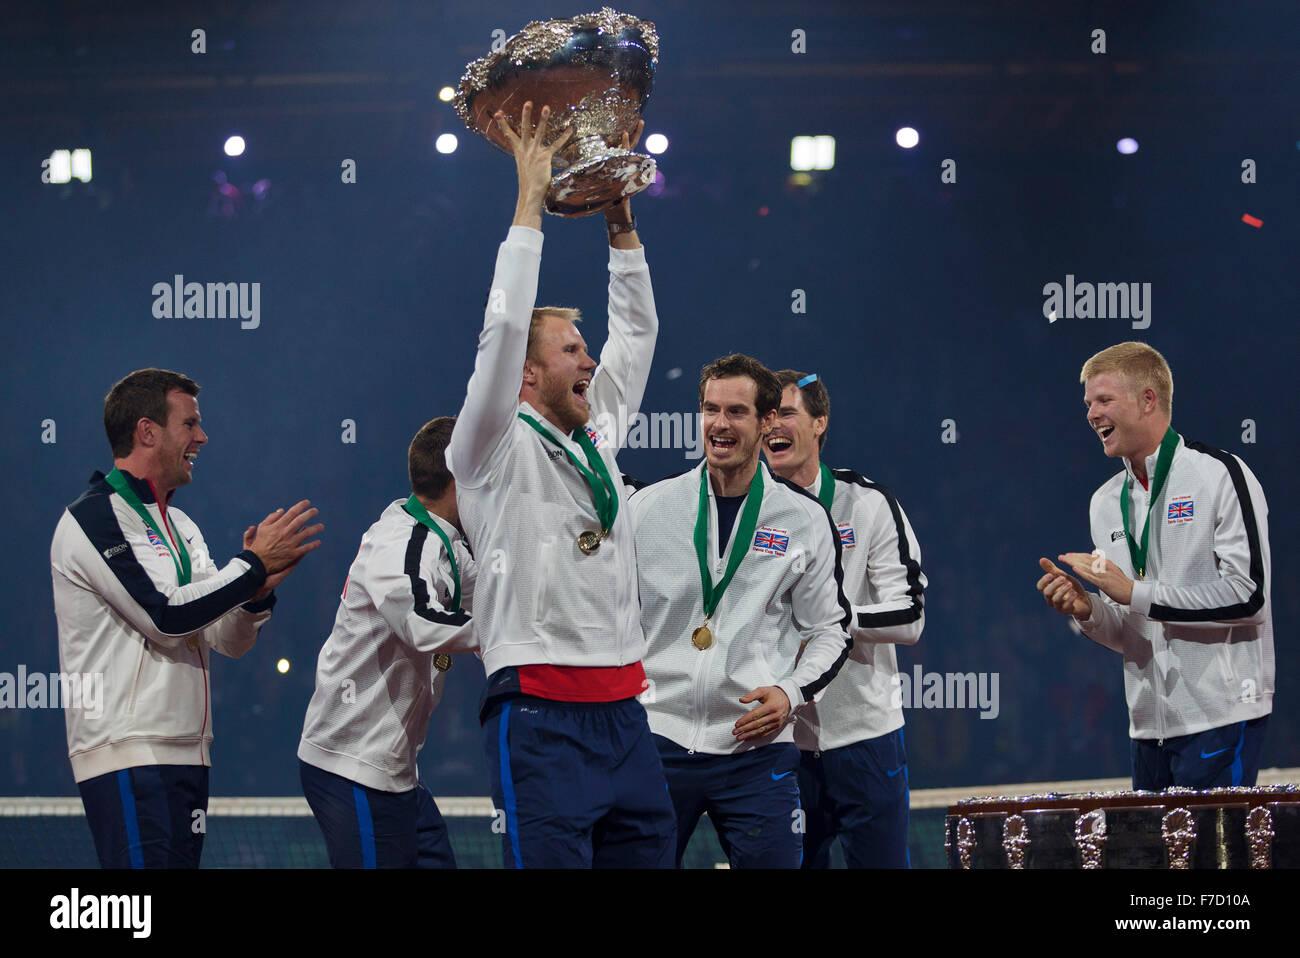 Gent, Belgium, November 29, 2015, Davis Cup Final, Belgium-Great Britain, day three, The Team of Great Britain celebrate - Stock Image